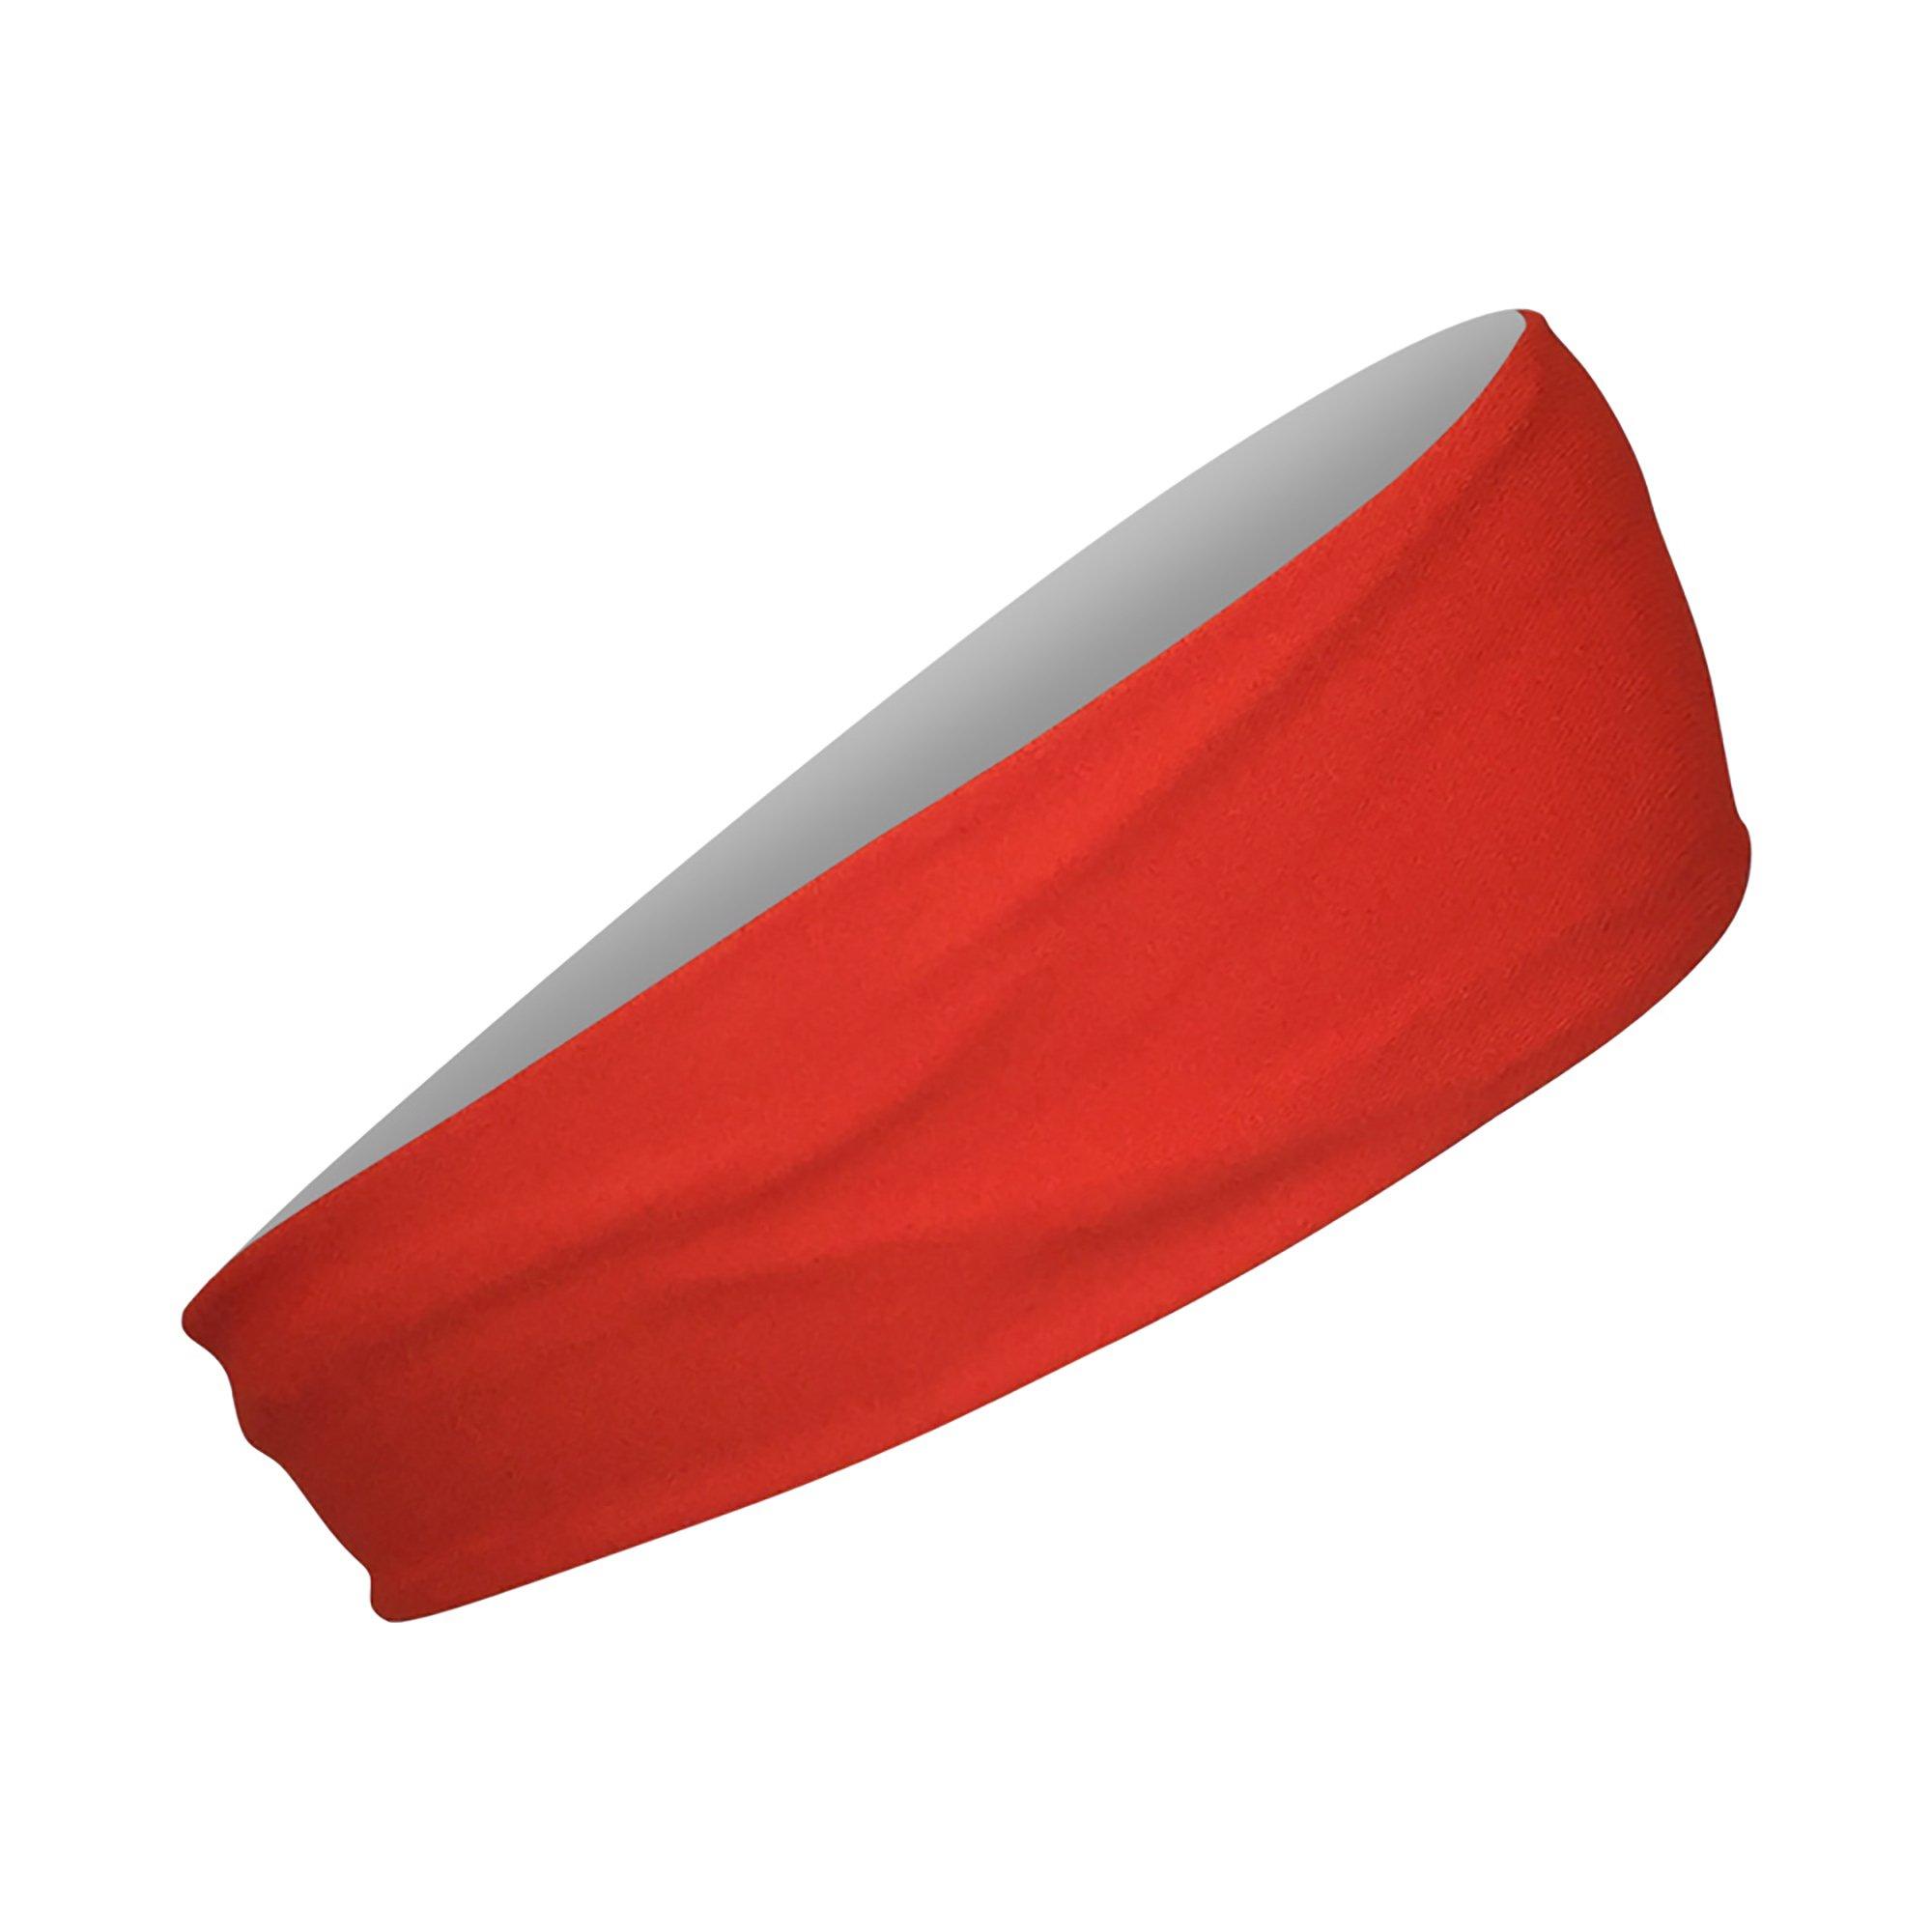 Cooling Headbands Moisture Wicking Womens Sweatband & Sports Headband | Workouts Cardio Running Yoga (Construction Orange) by Bani Bands (Image #2)